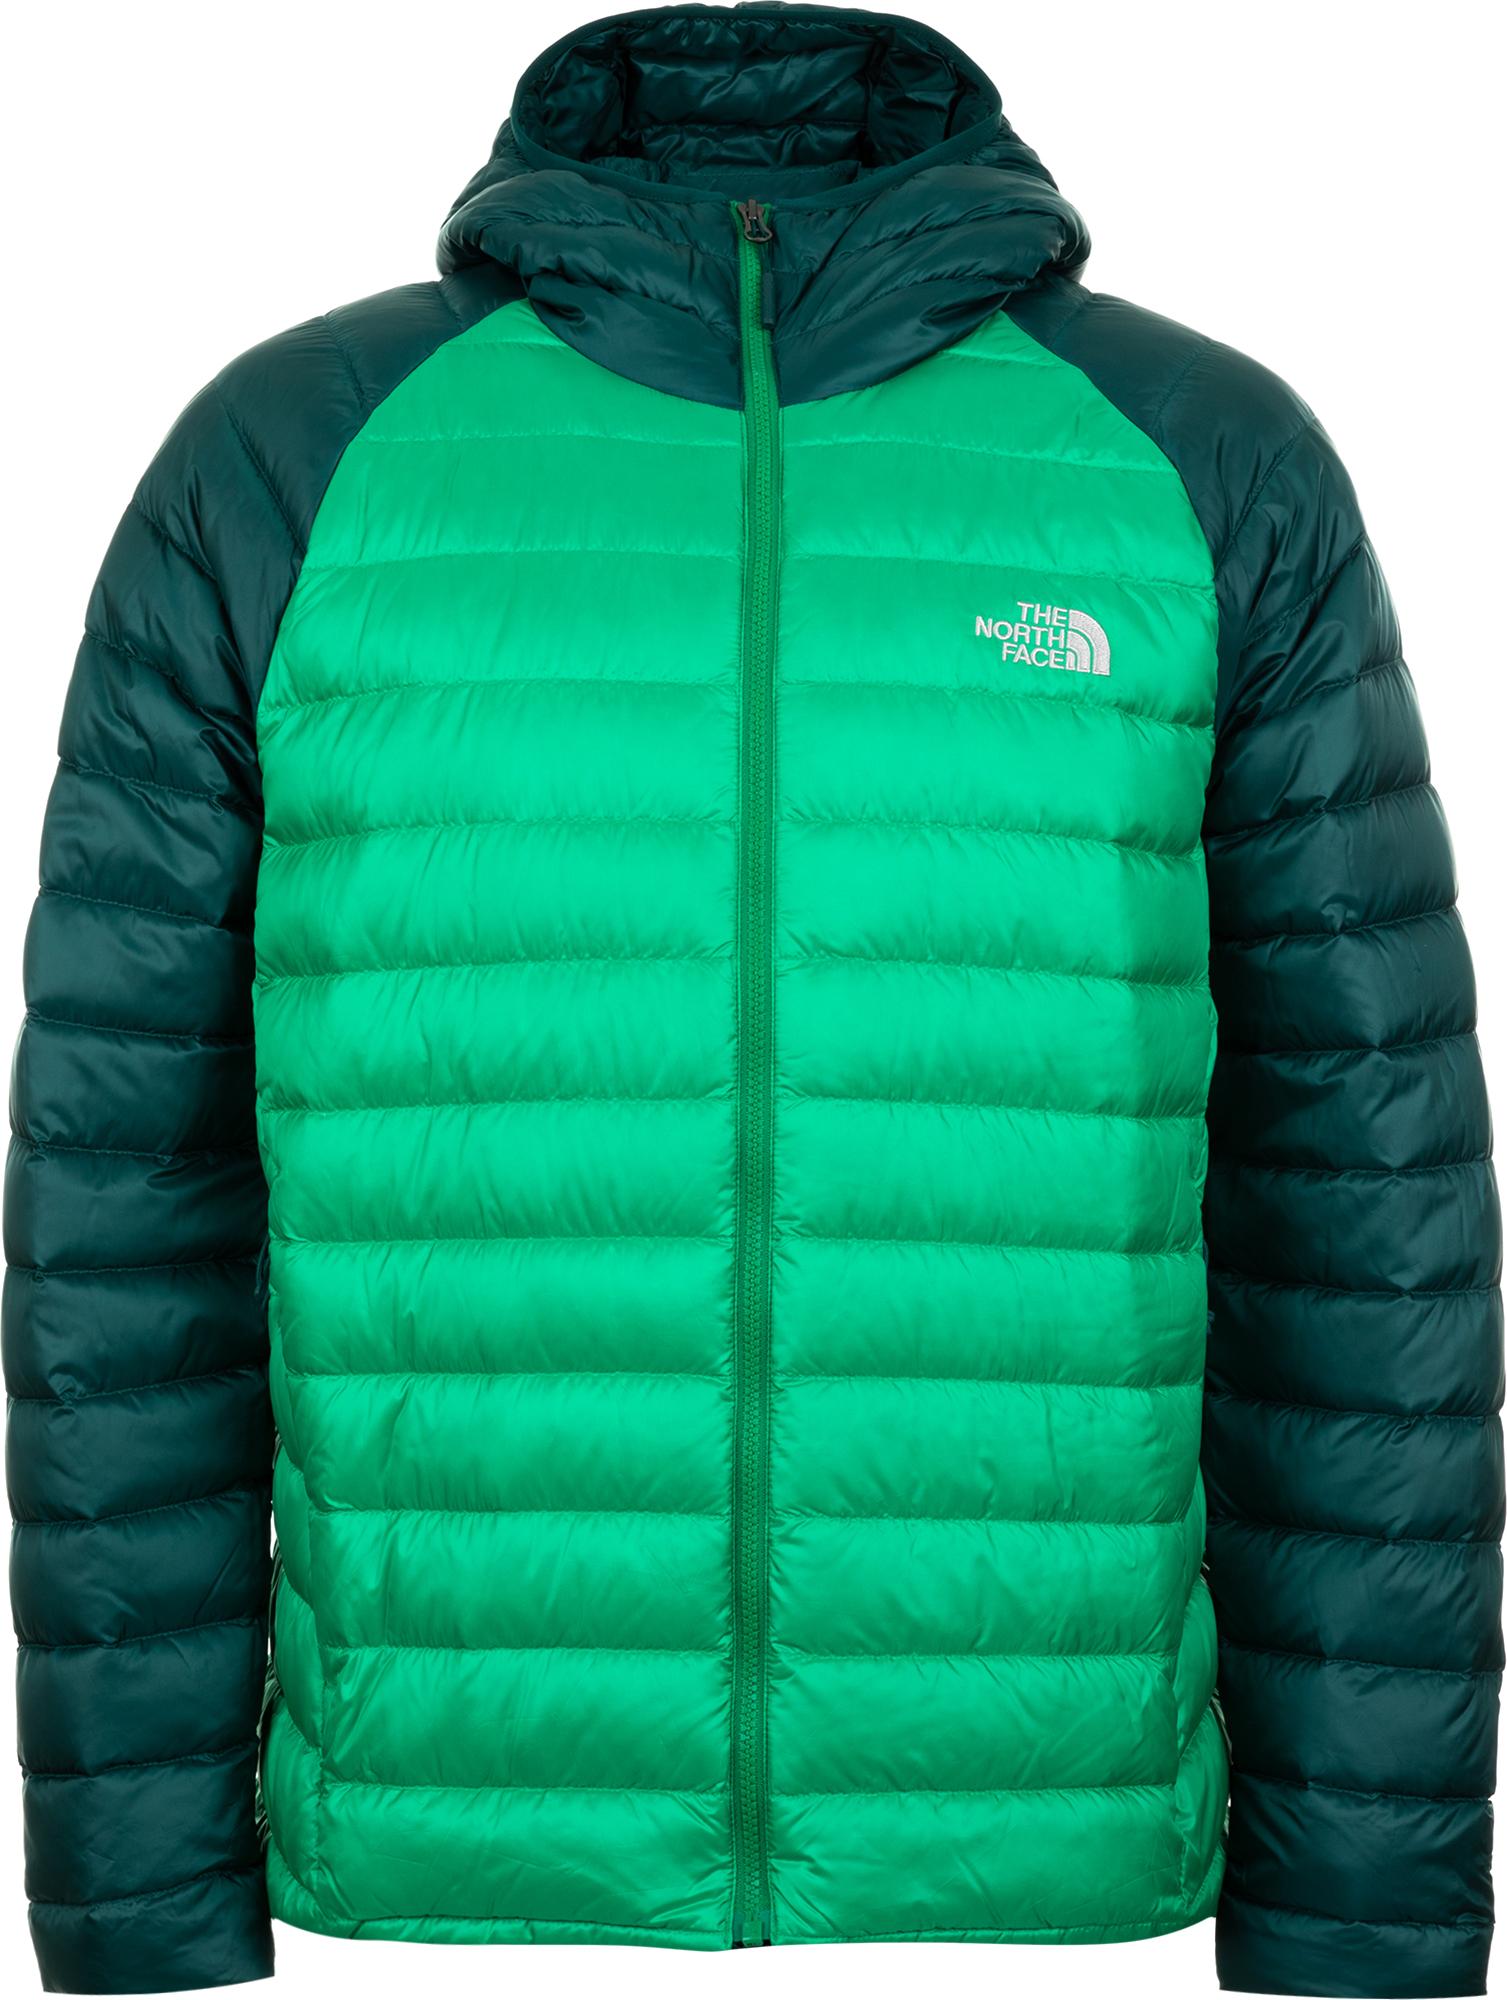 The North Face Куртка пуховая мужская The North Face Trevail, размер 52 цена